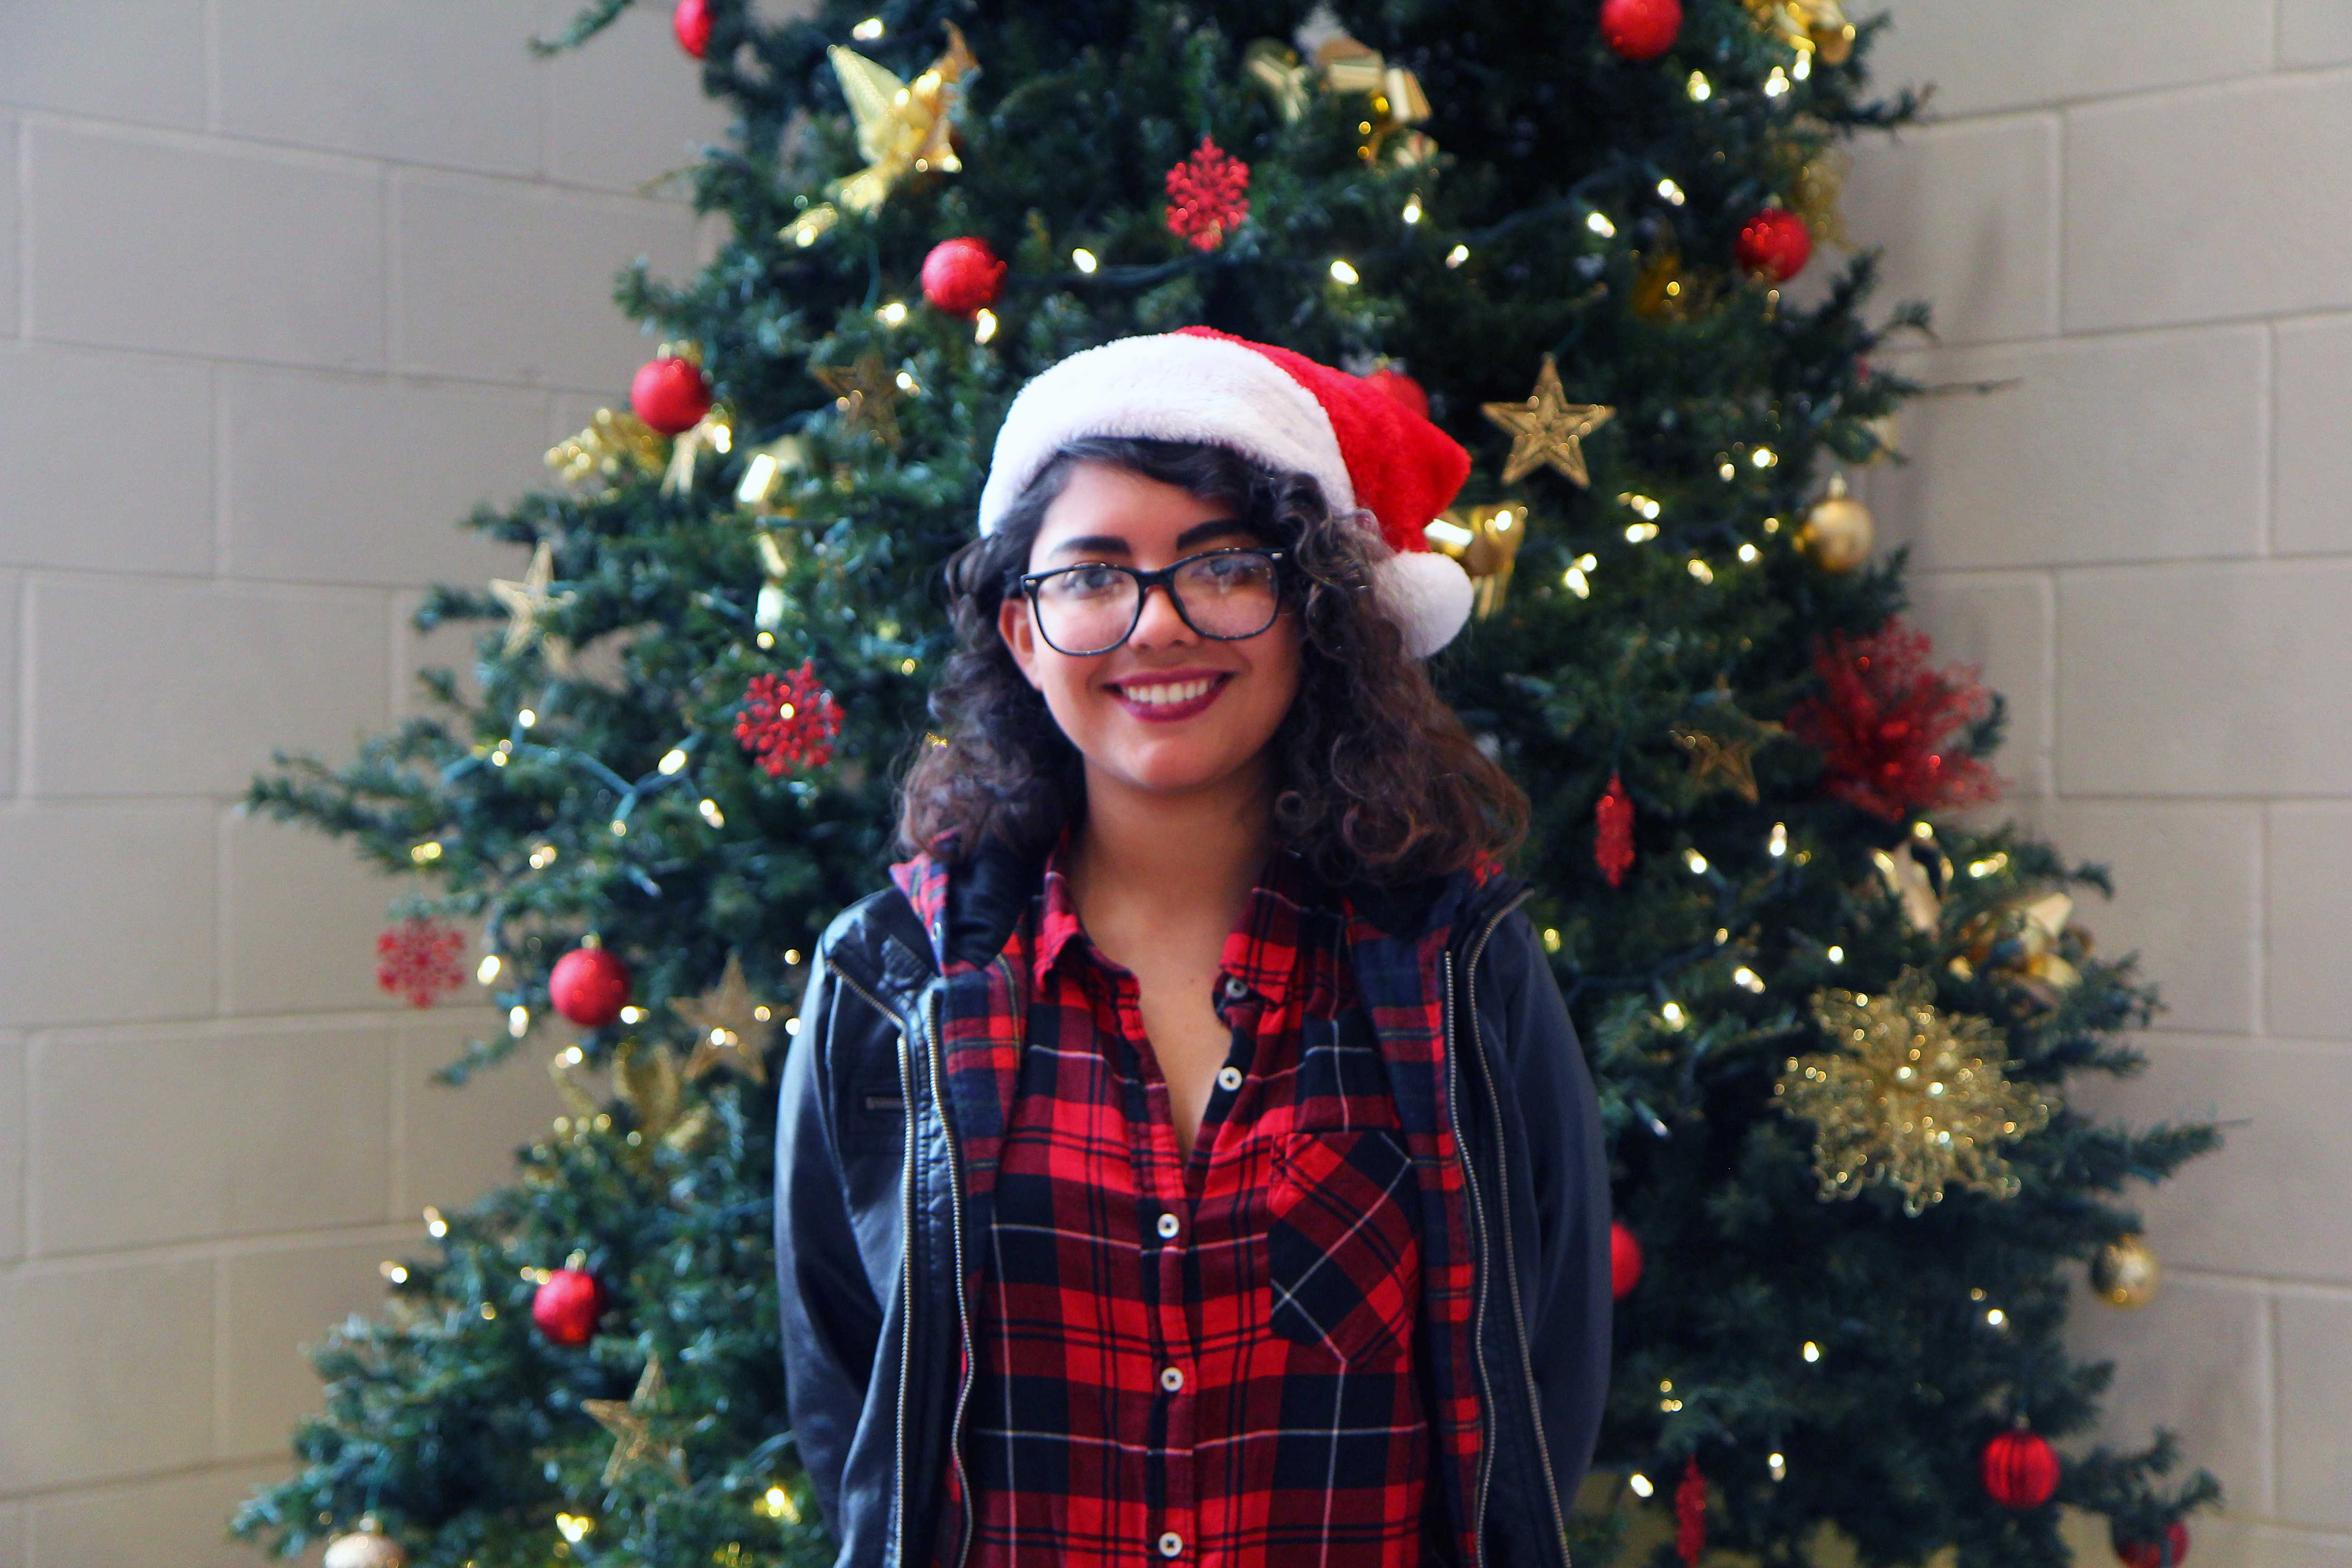 Christmas 17′ Dress-Up Week